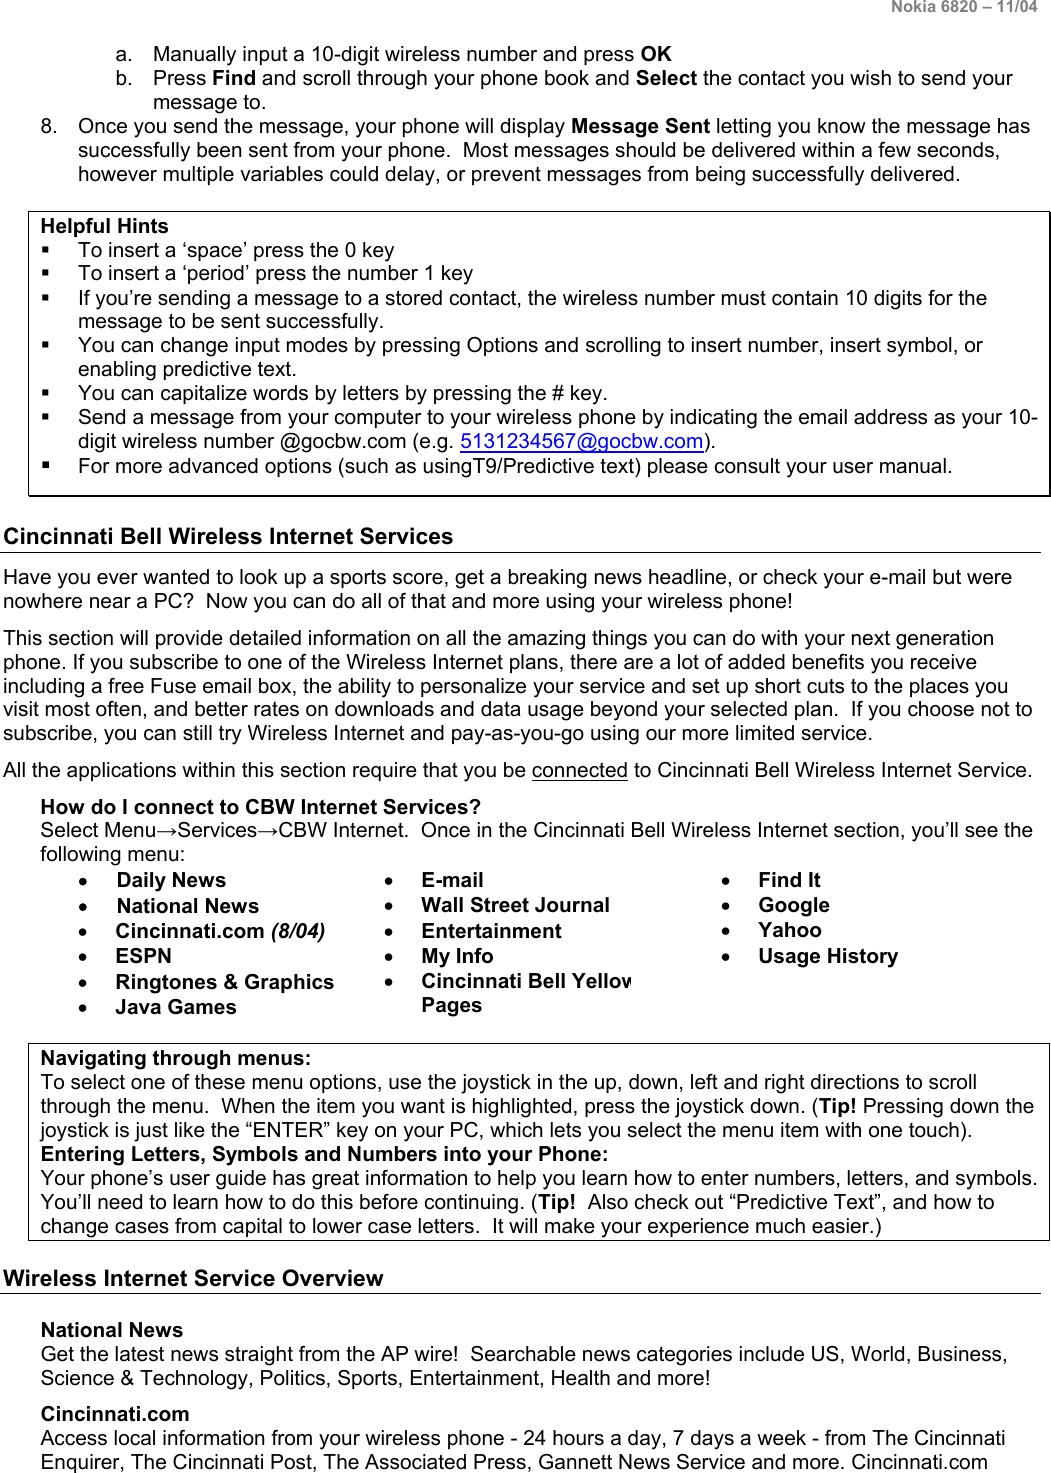 Cincinnati Bell Cell Phone 6820 Users Manual CBW Internet Services